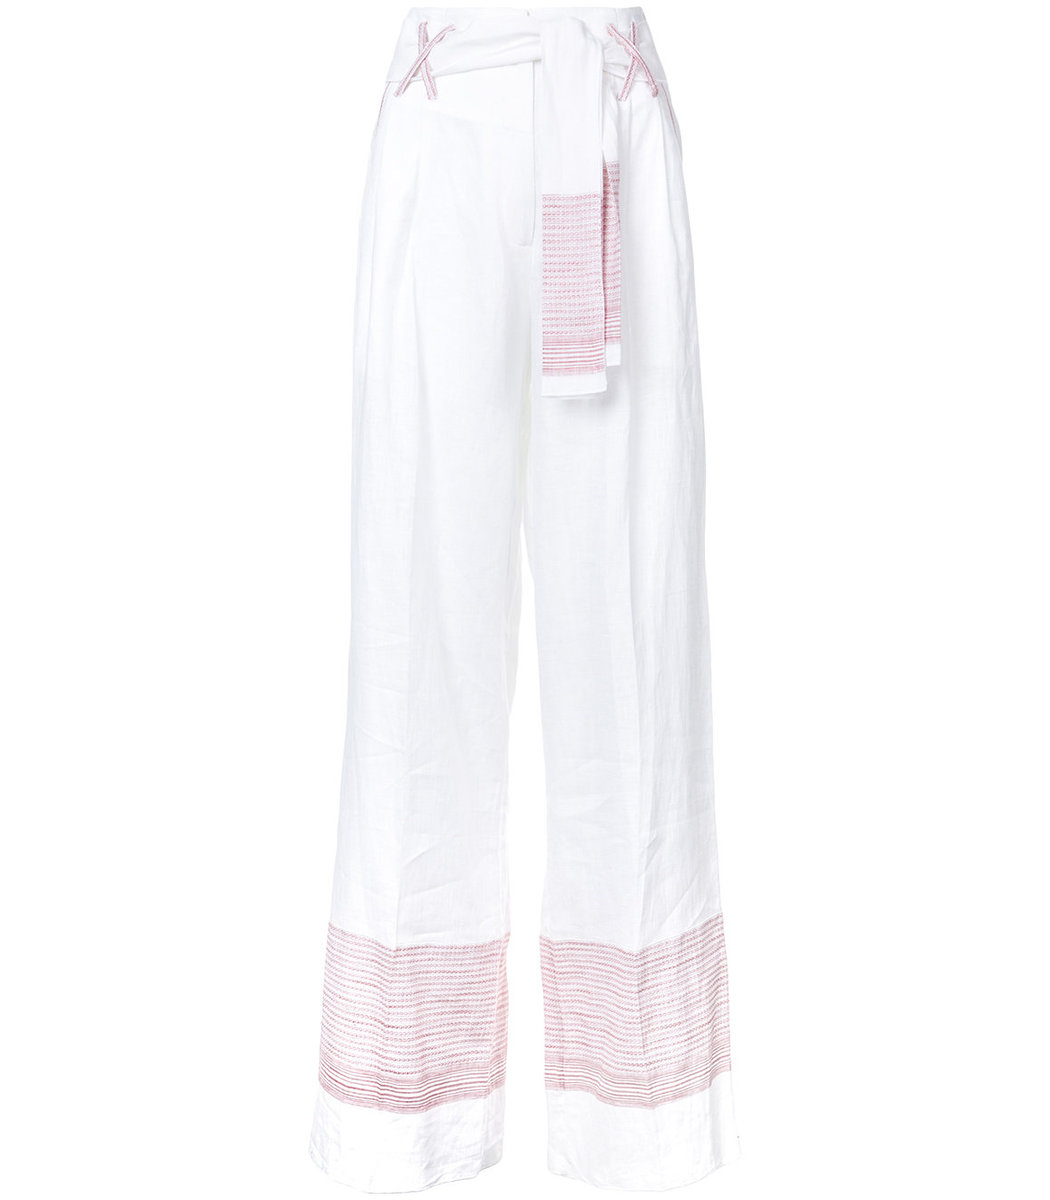 Gül Hürgel High-Waisted Wide Leg Trousers